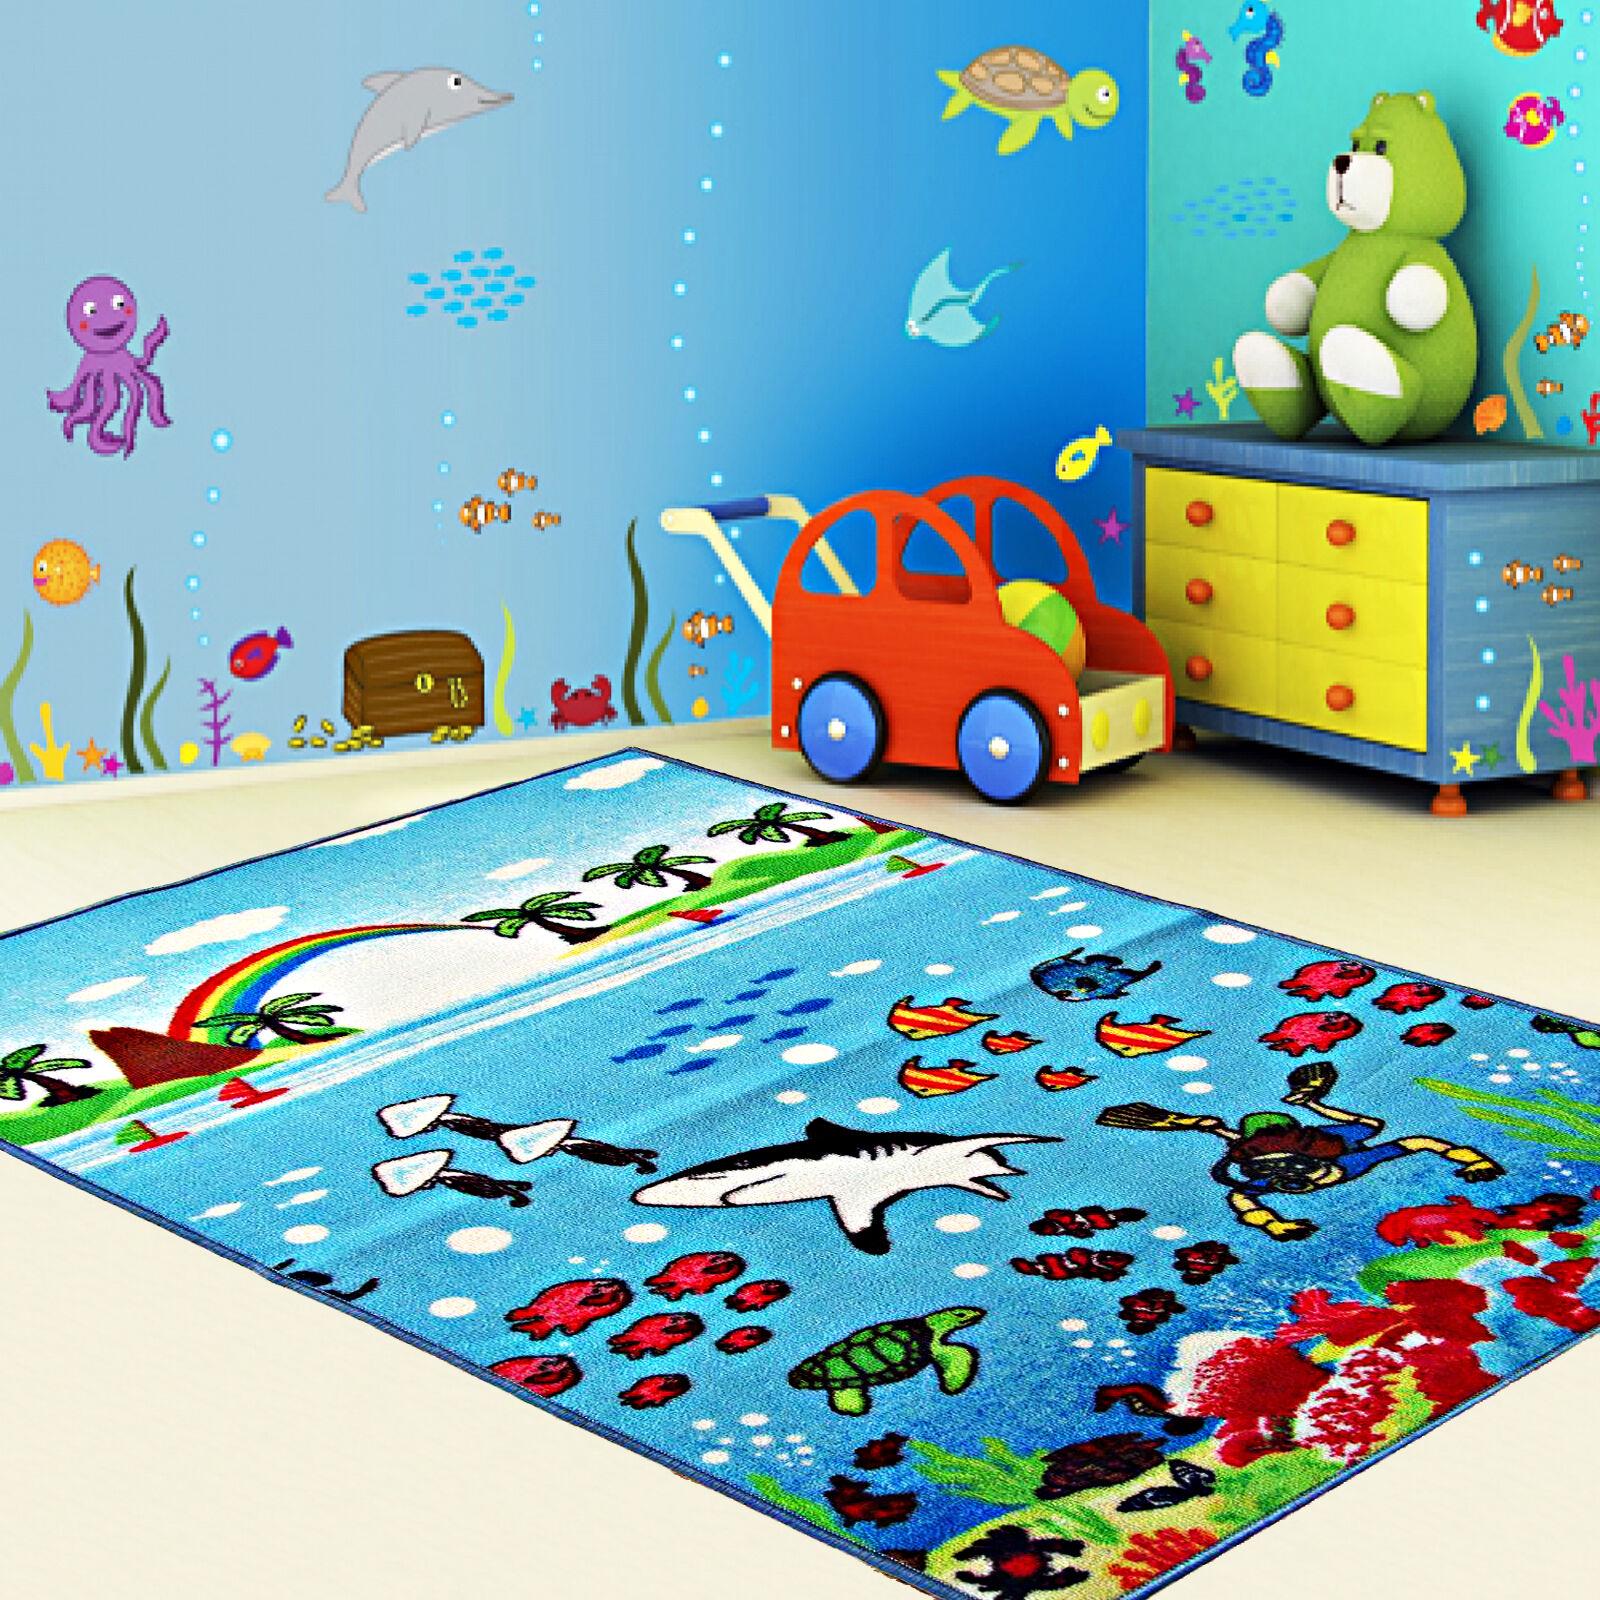 rugs boys room carpet bedroom modern white for design itm zigzag rug girls kids durabl teal